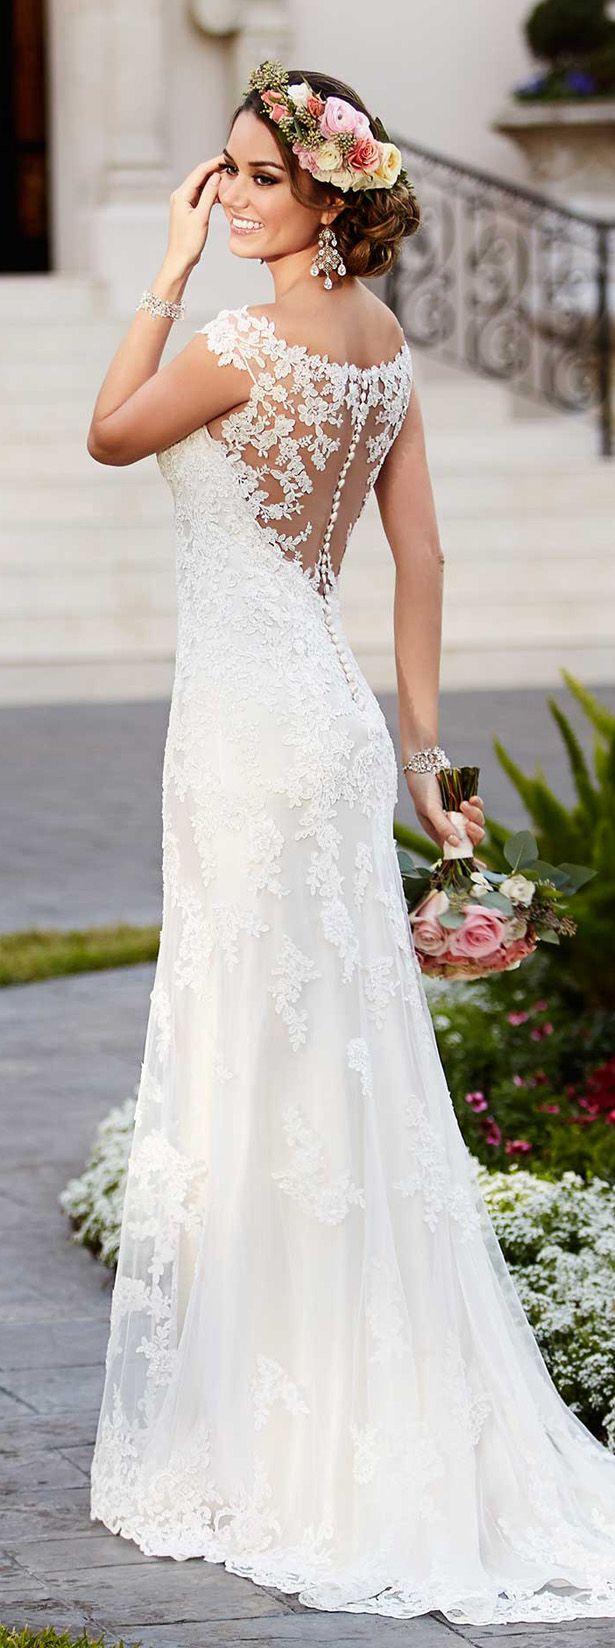 Wedding Spring dresses pinterest photo